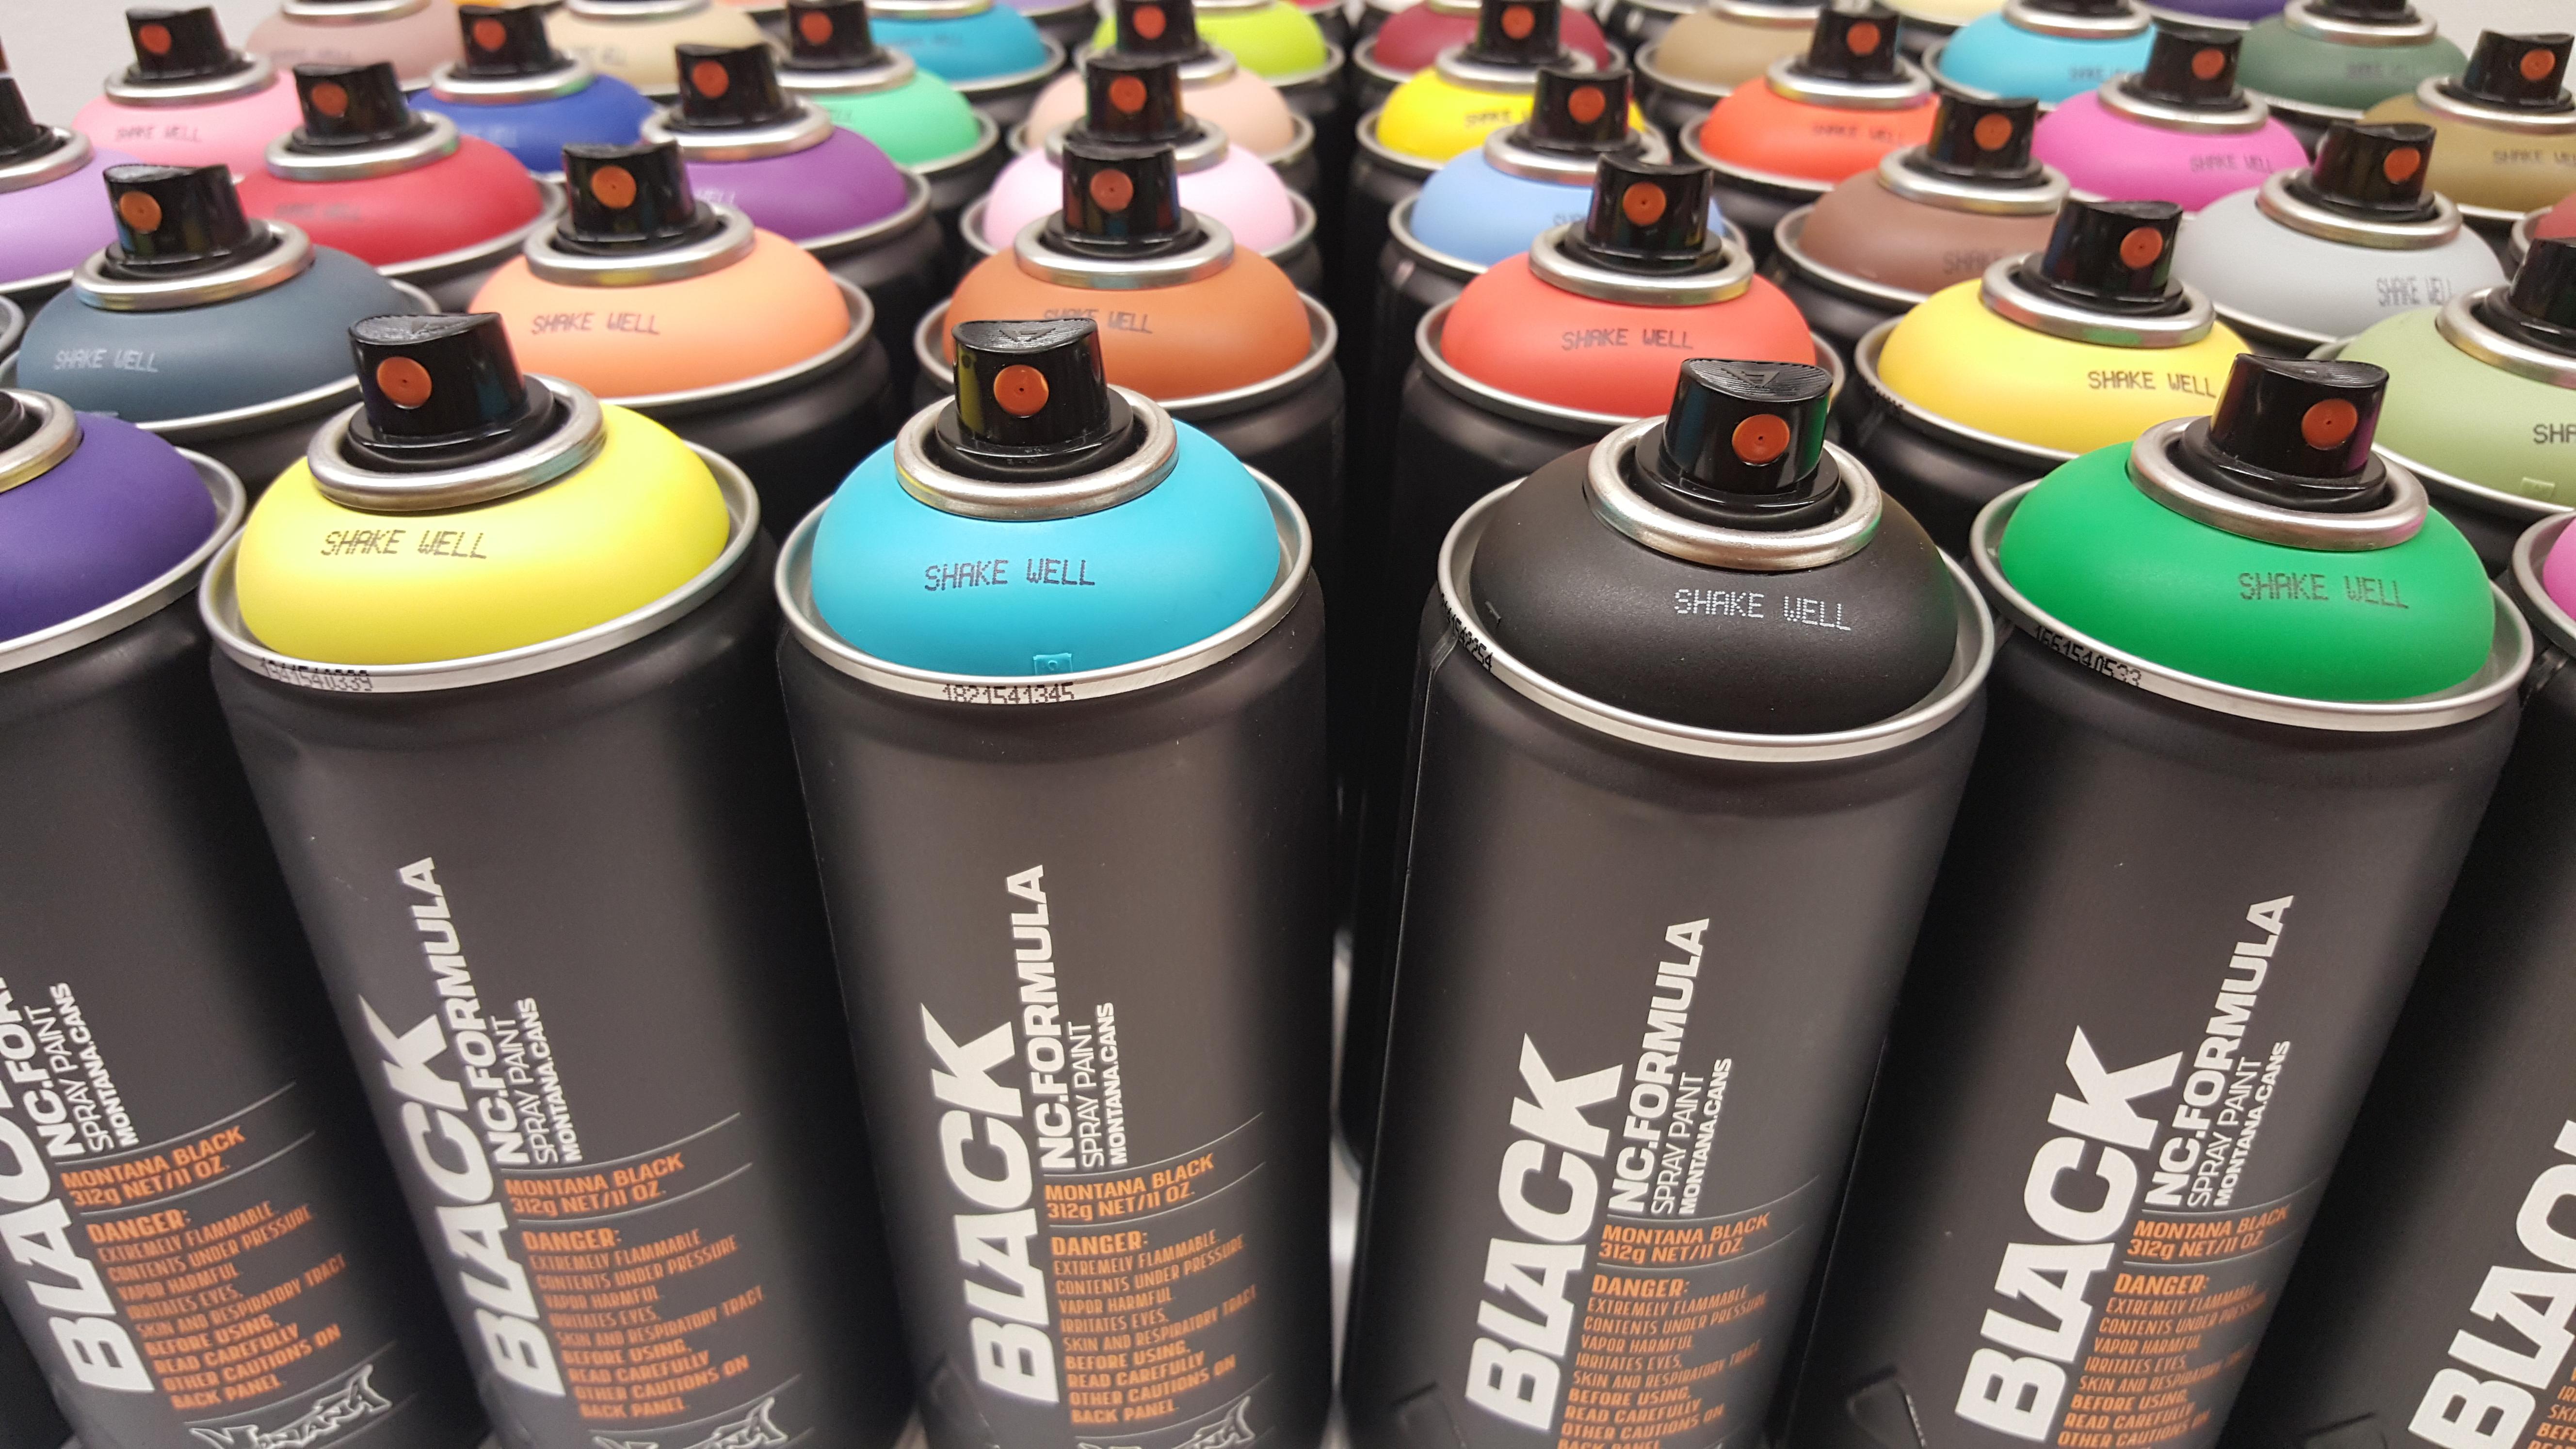 Montana-Cans Black Line Color Series Packs - Montana Black Line